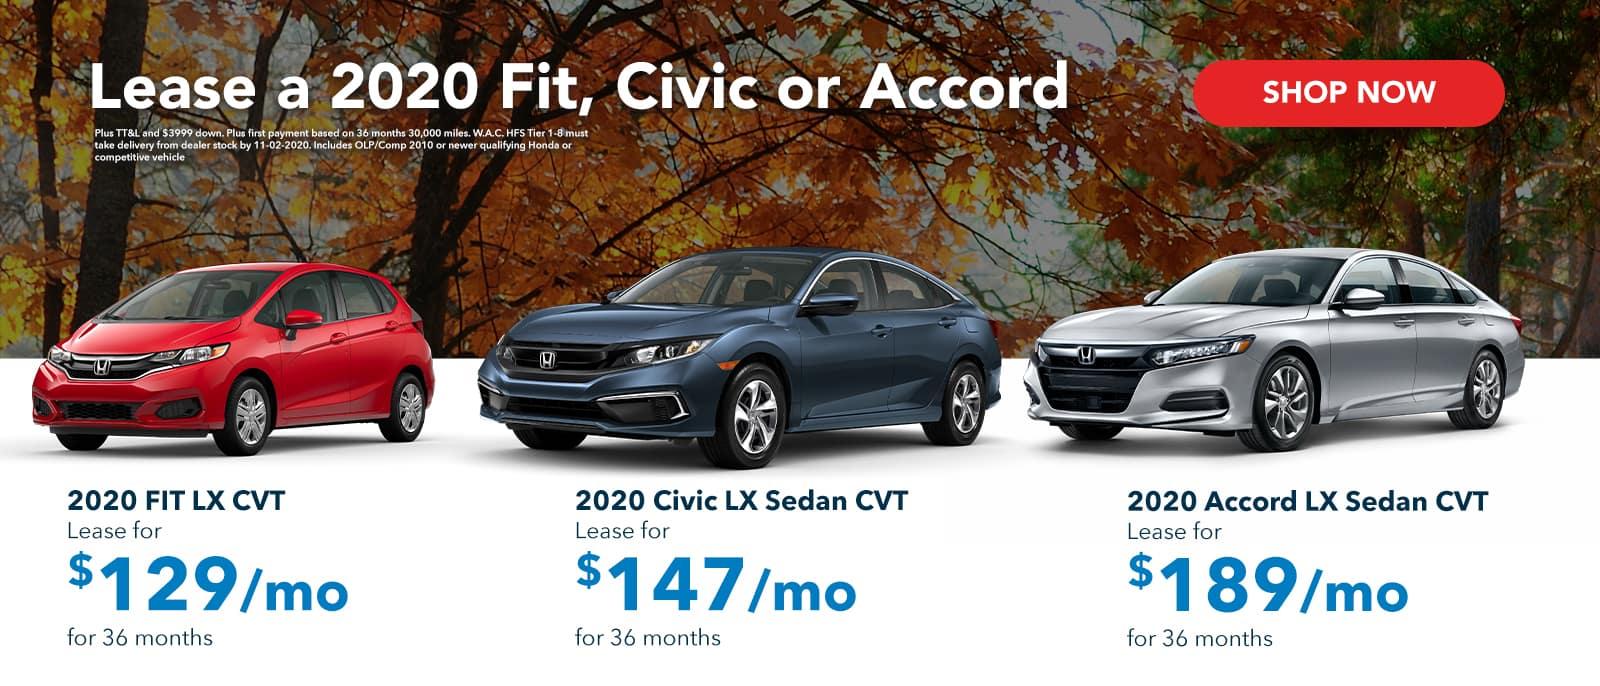 FSHRHD_SL_1600x686_Fit-Civic-Accord